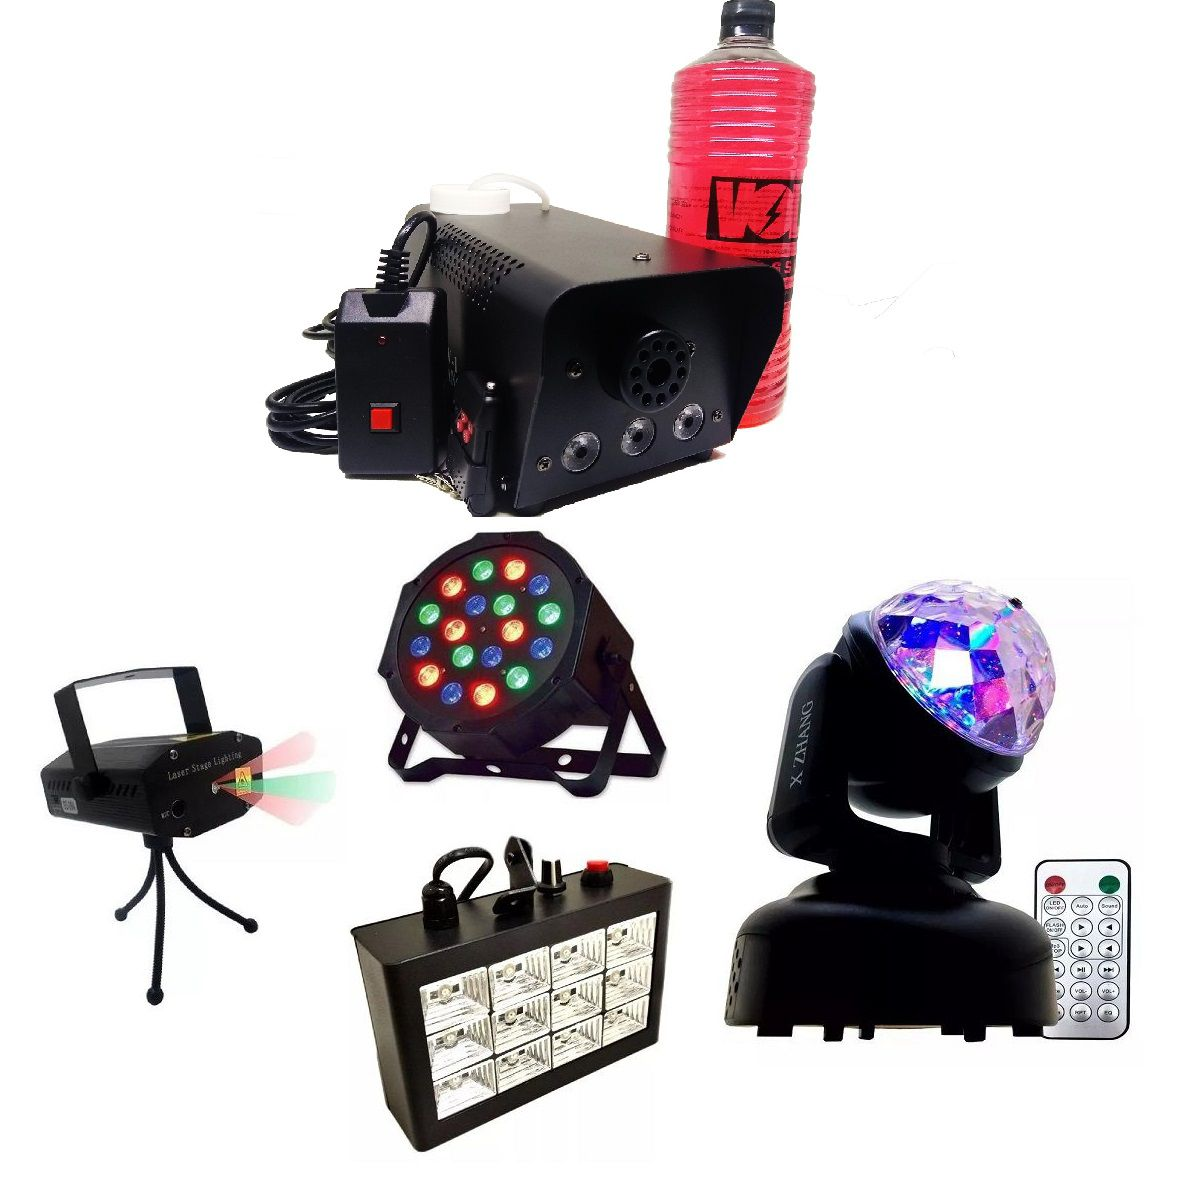 Kit Mini Moving Head RGB Bola Maluca + Strobo 12 LEDs Branco Rítmico + Mini Laser Projetor Holográfico + Canhão Luz 18 LEDs + Maquina Fumaça 600W + Líquido - HL-080+12LEDBR+SD-08+18LEDSLIM+XH-600W